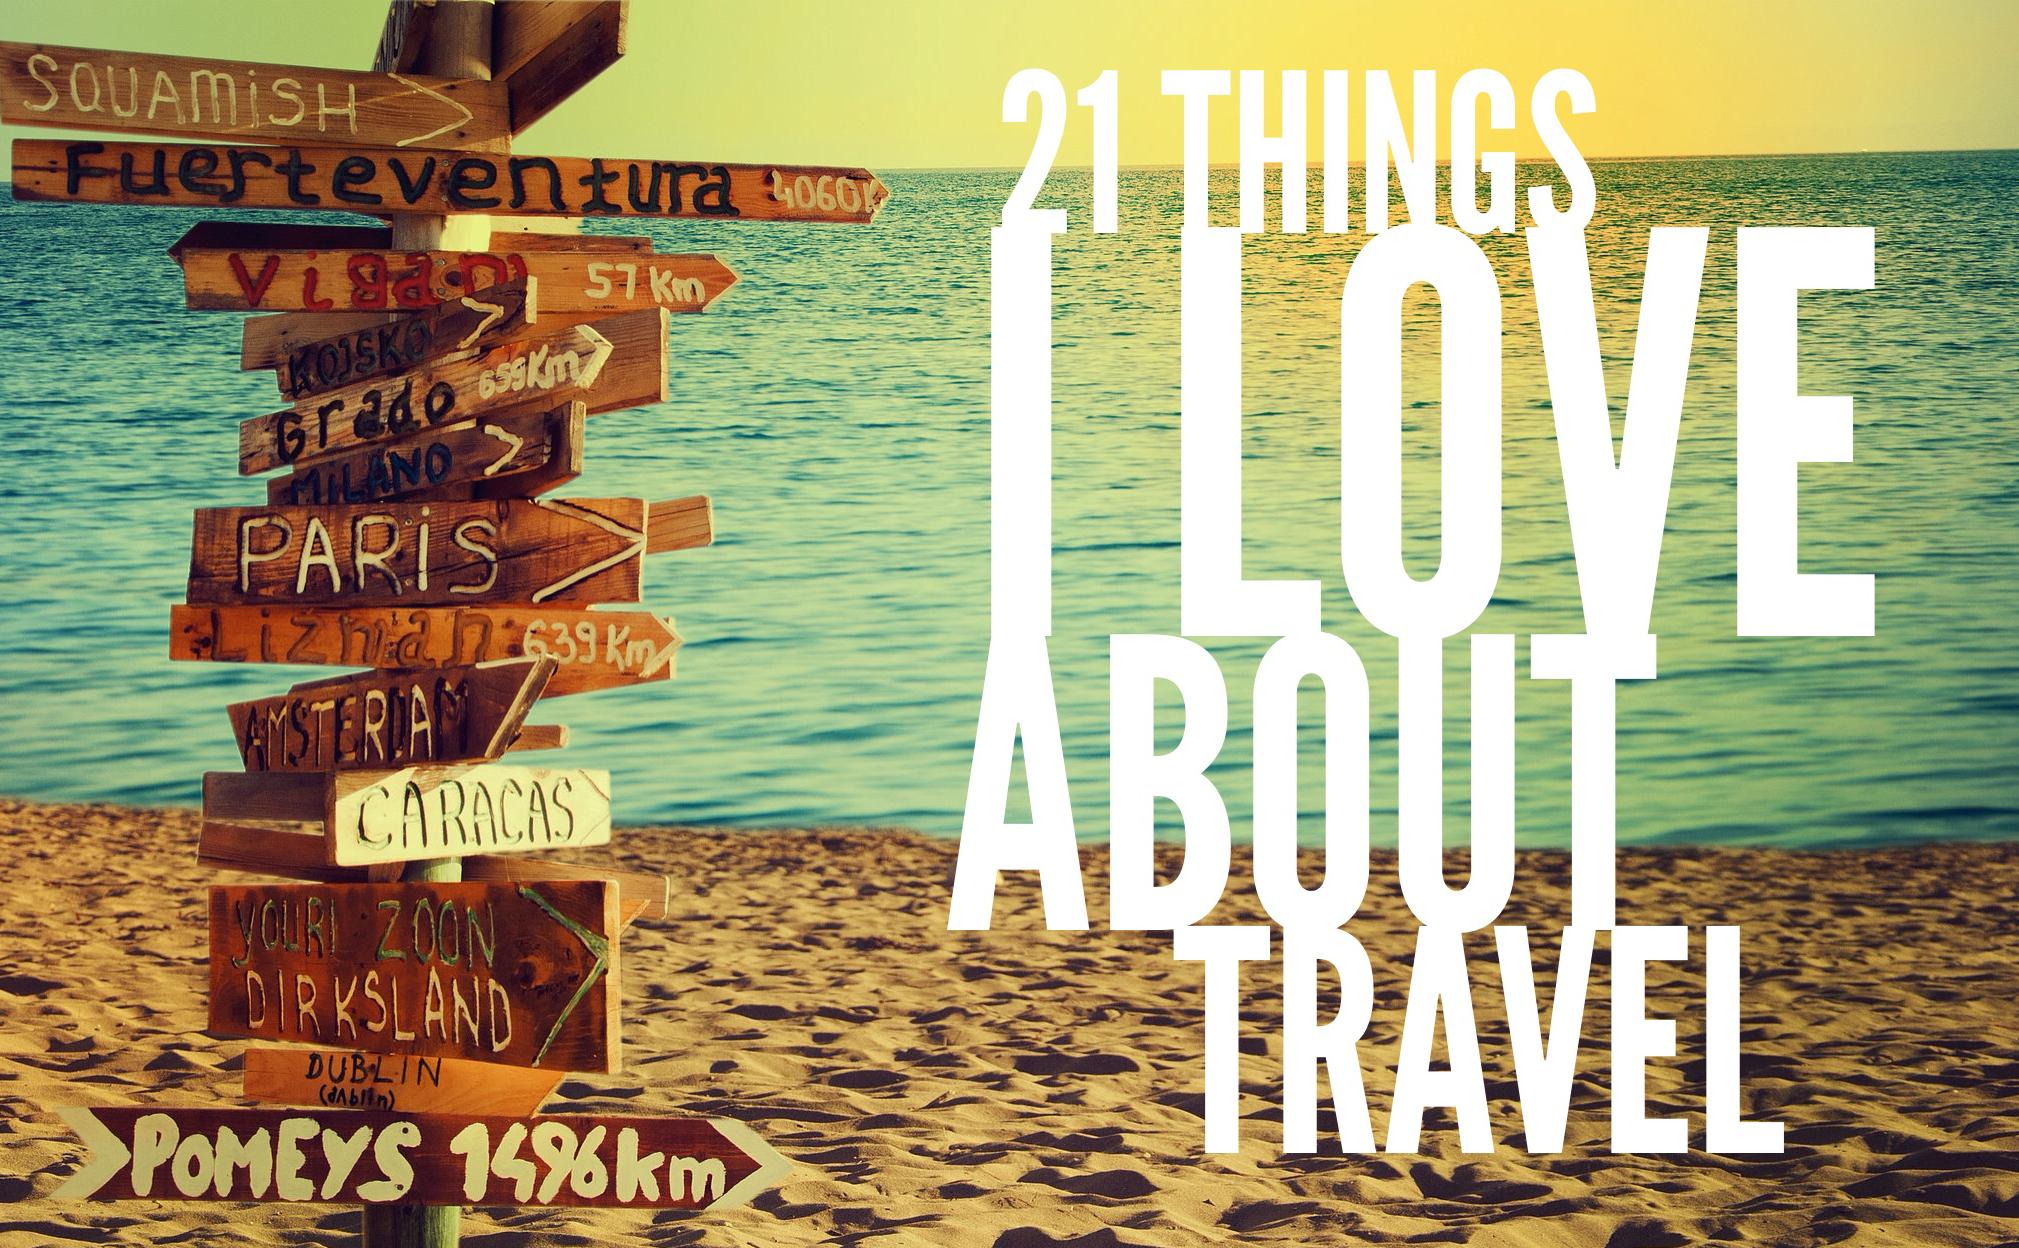 21 things travel